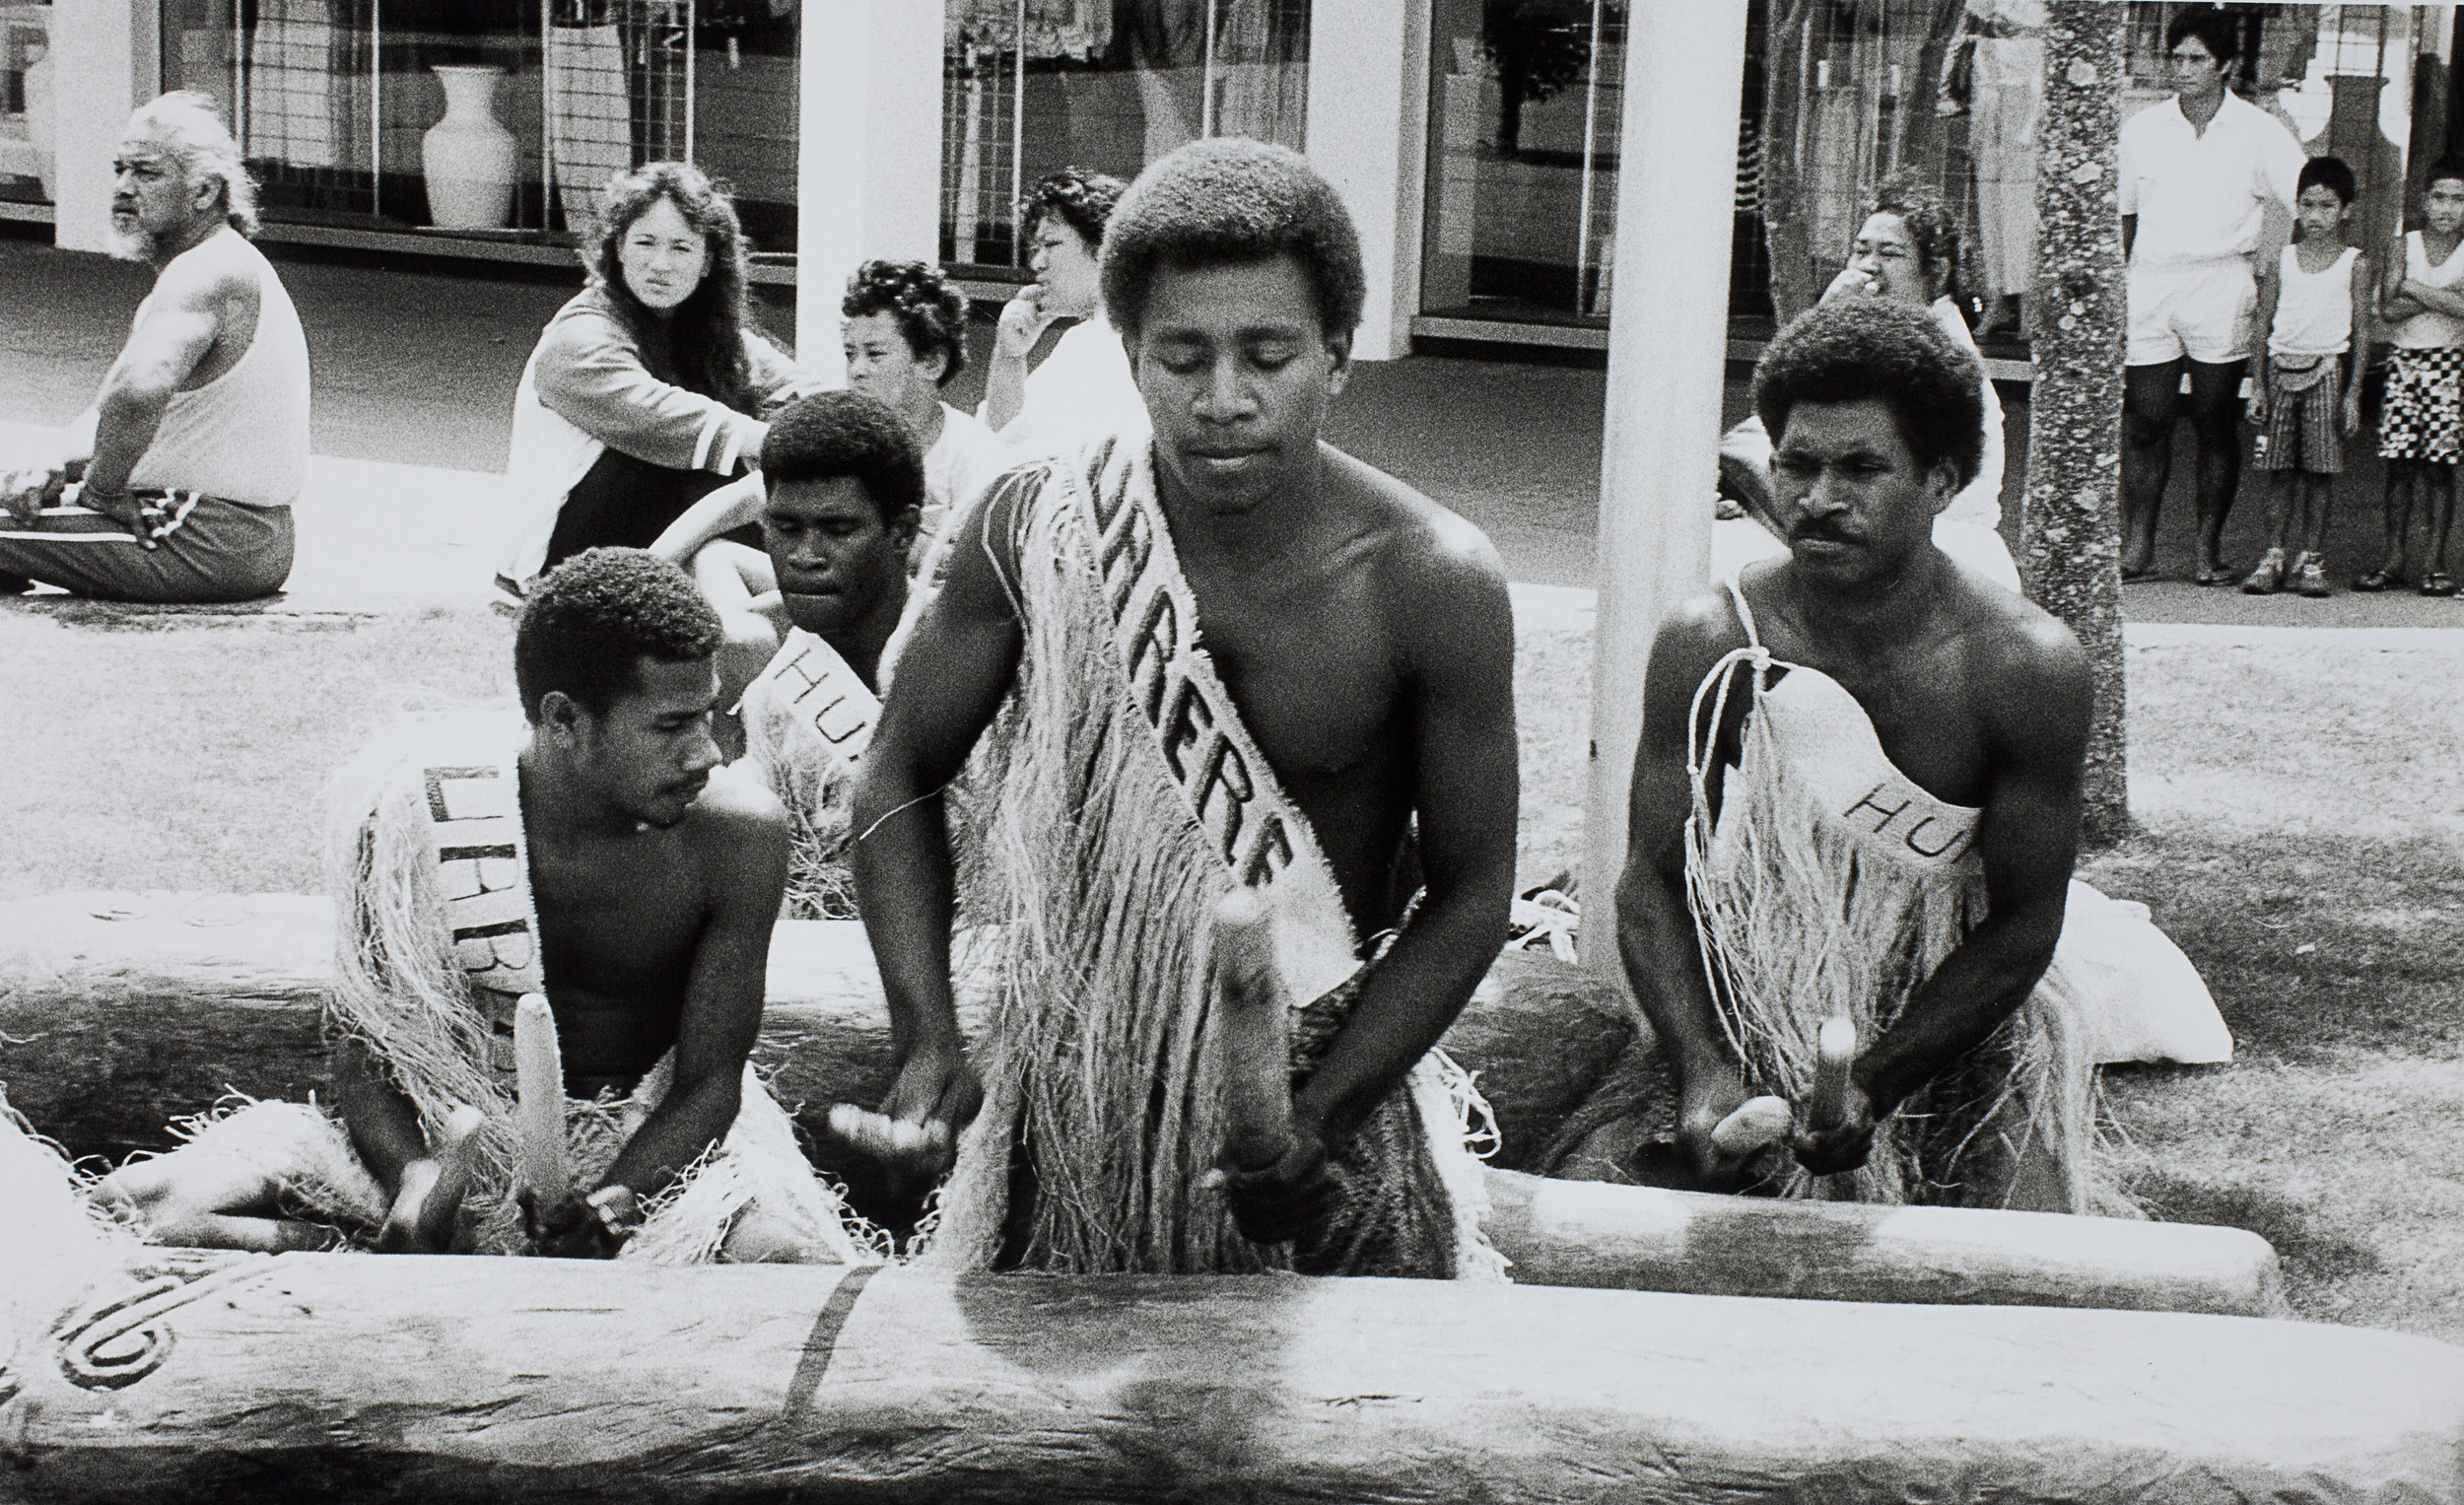 Drums of Melanesia, Manukau, 1990. Creator: Unknown Date: 27 January 1990 Footprints 03369